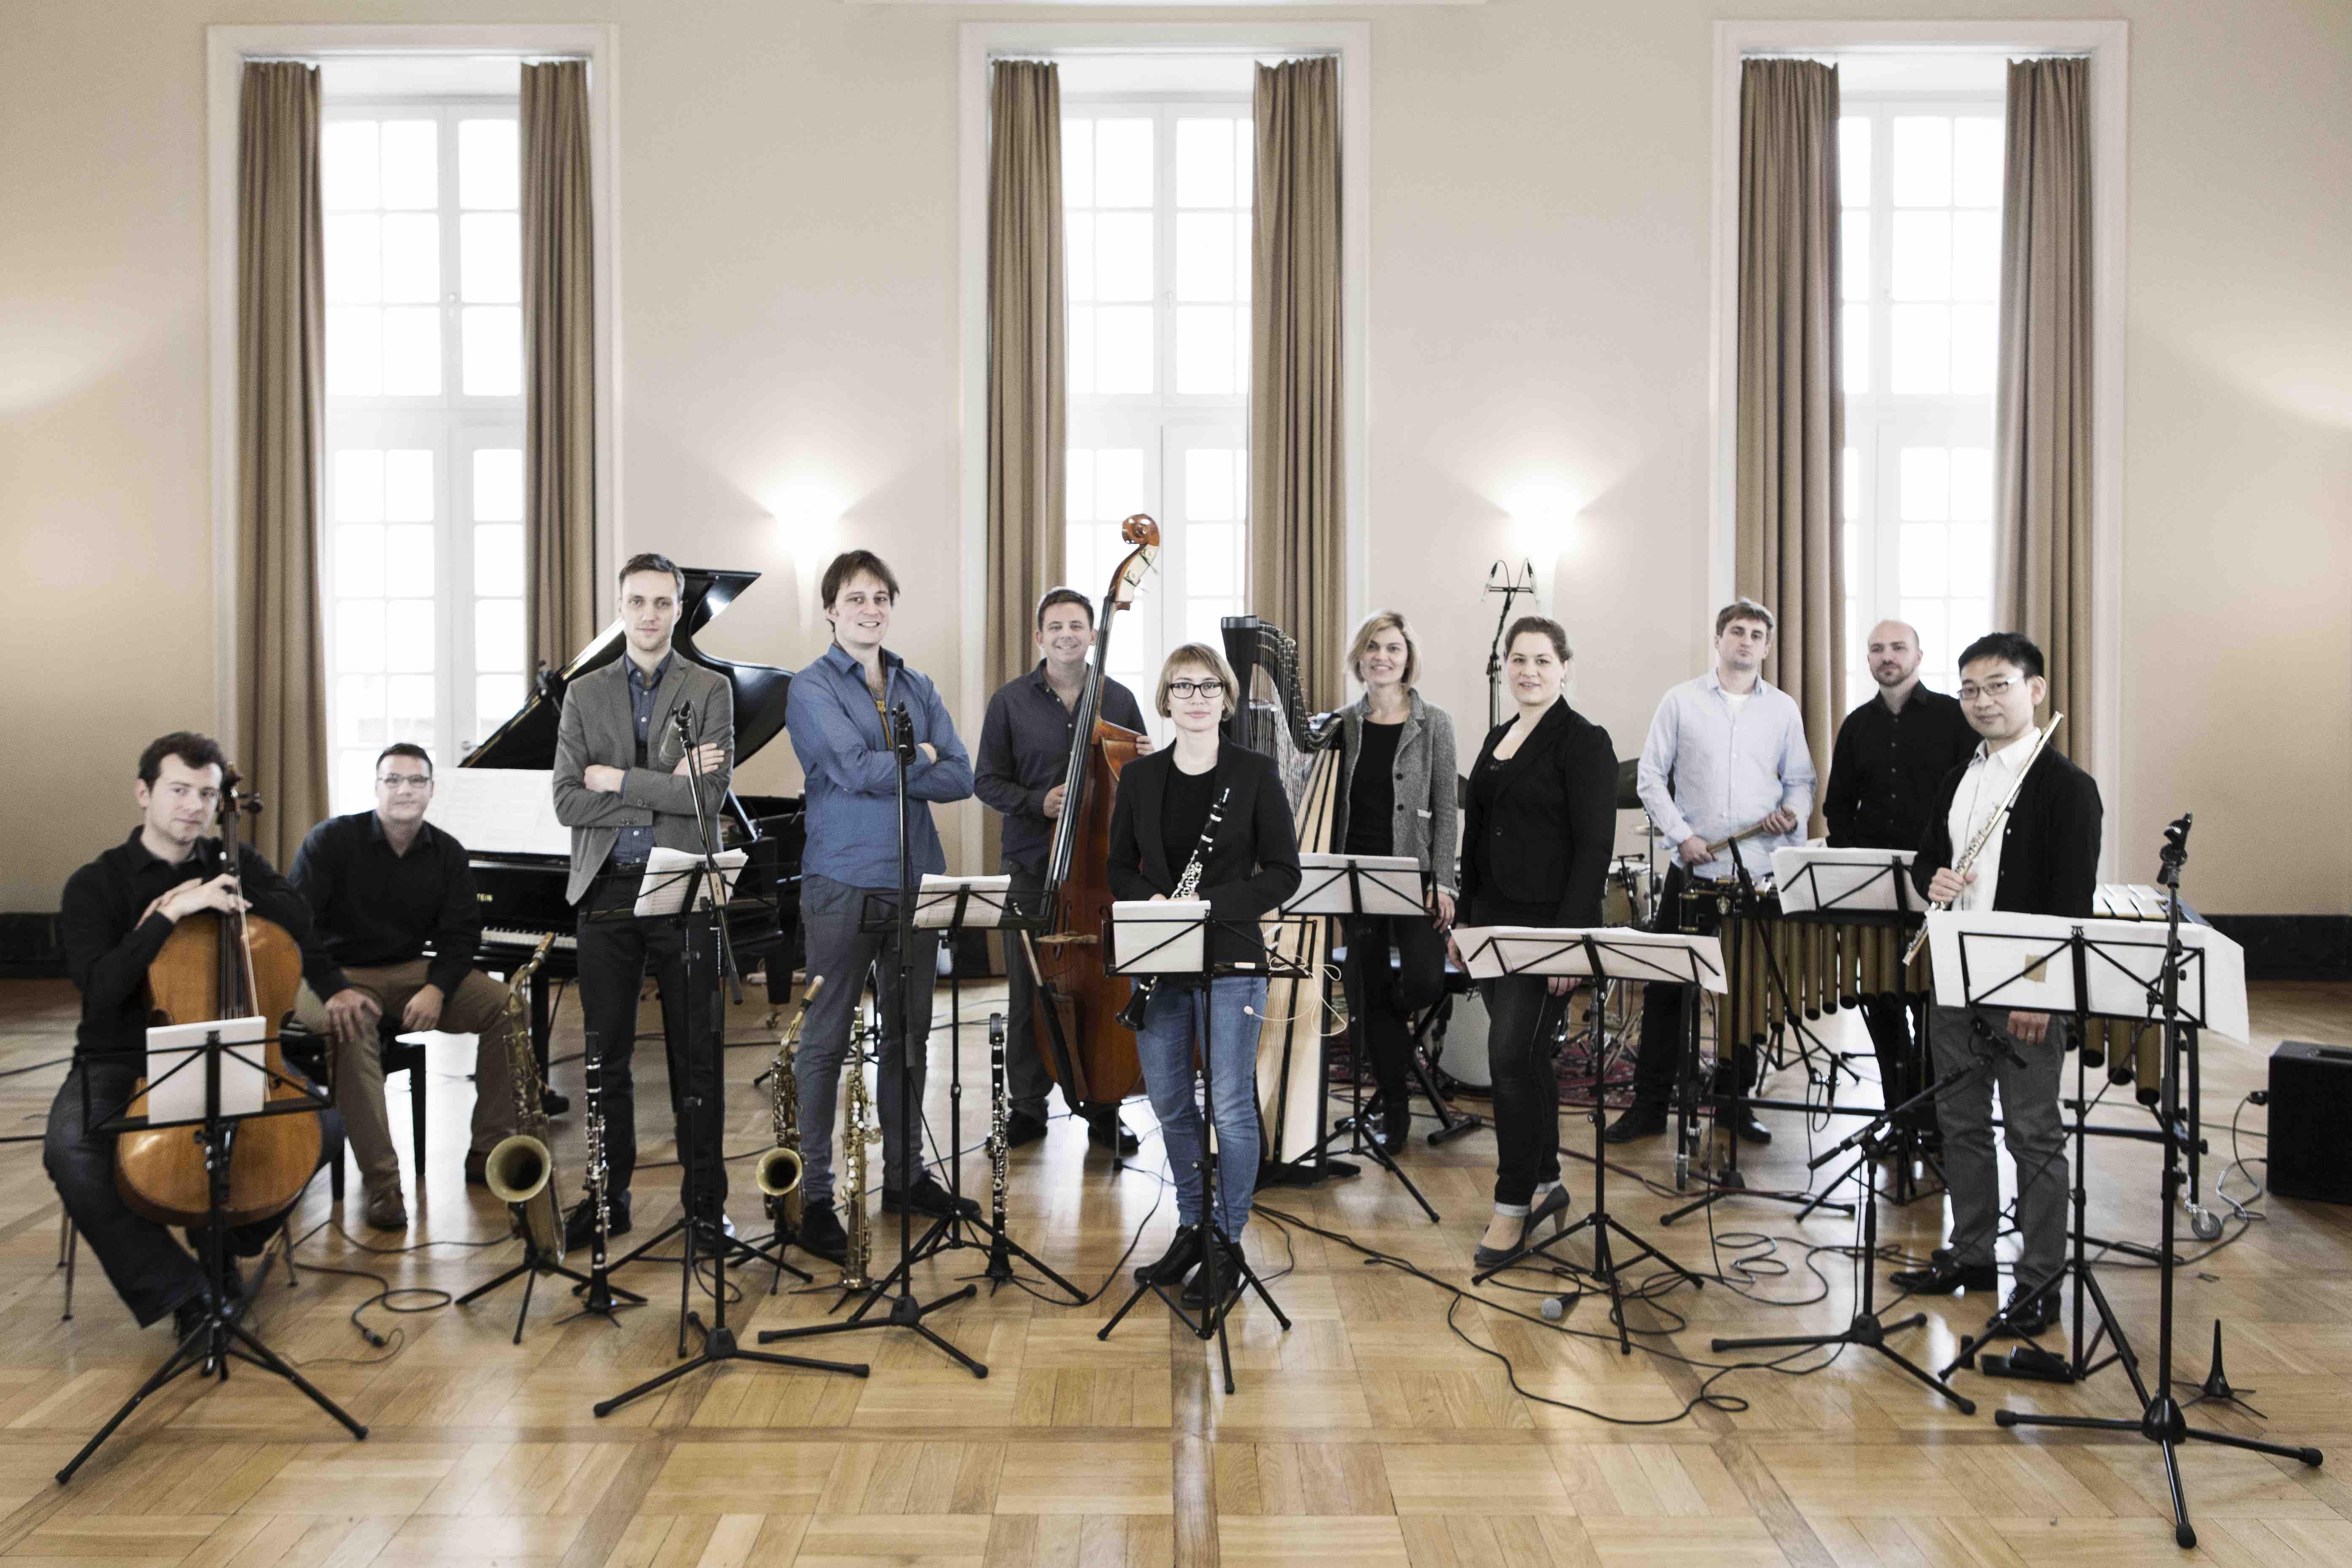 Rebecca Trescher's Ensemble 11